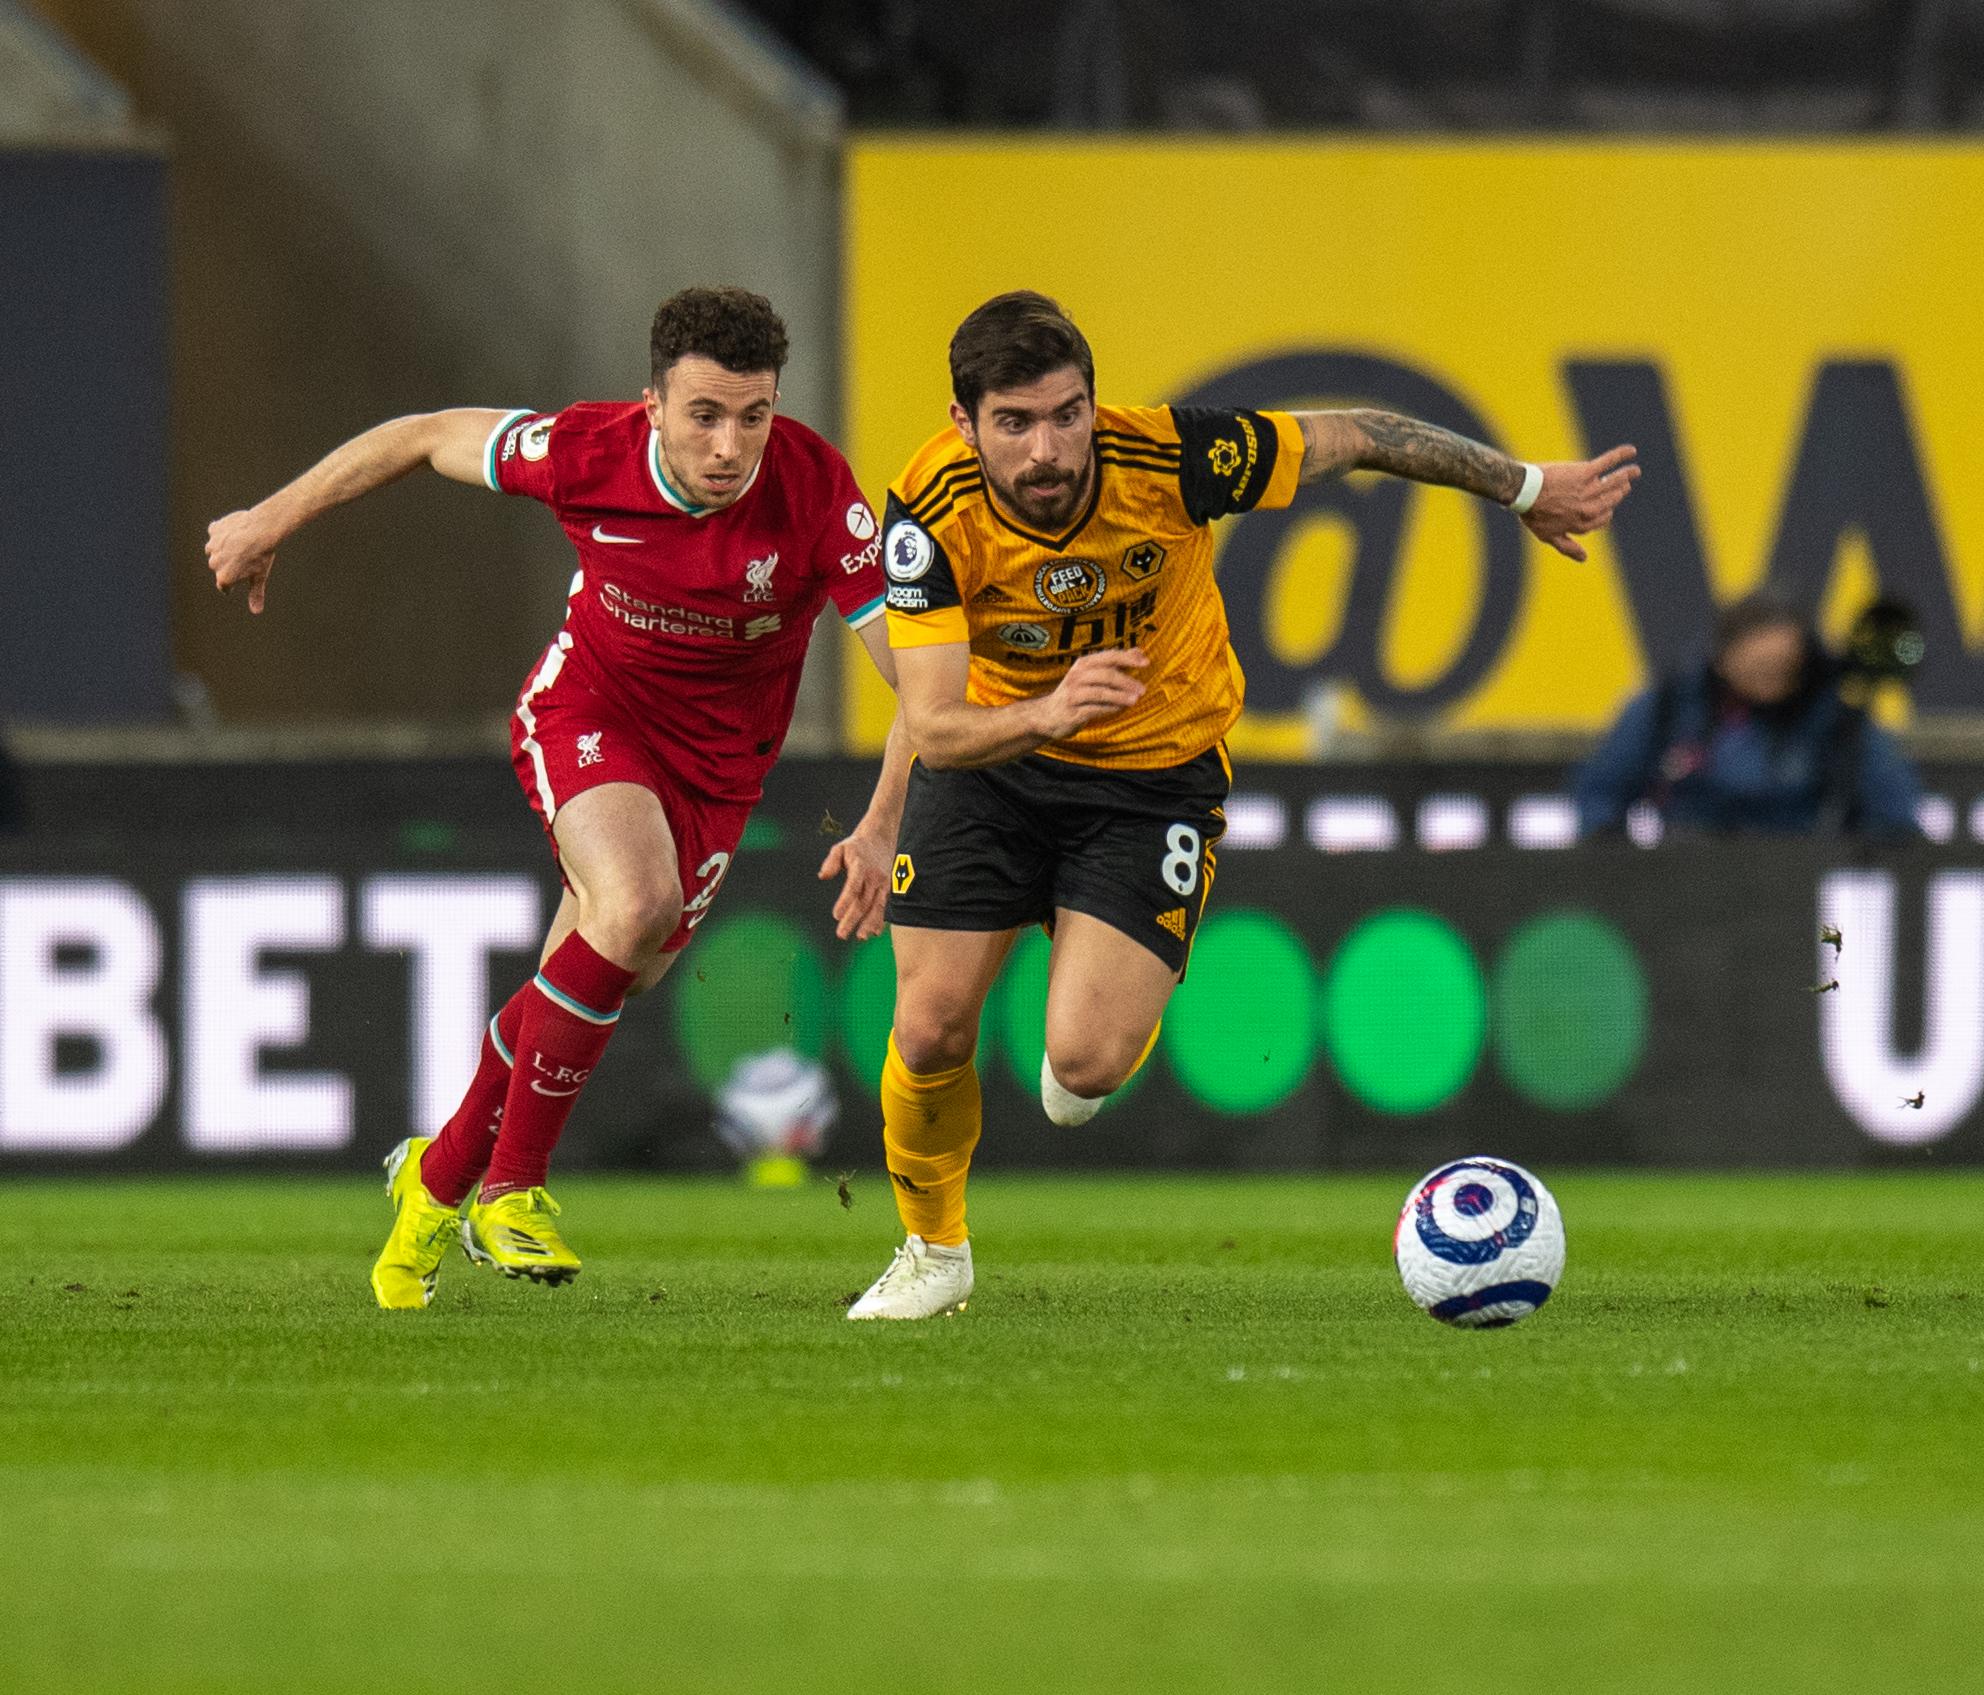 Diogo Jota vies for possession versus Ruben Neves - Wolverhampton Wanderers v Liverpool - Premier League